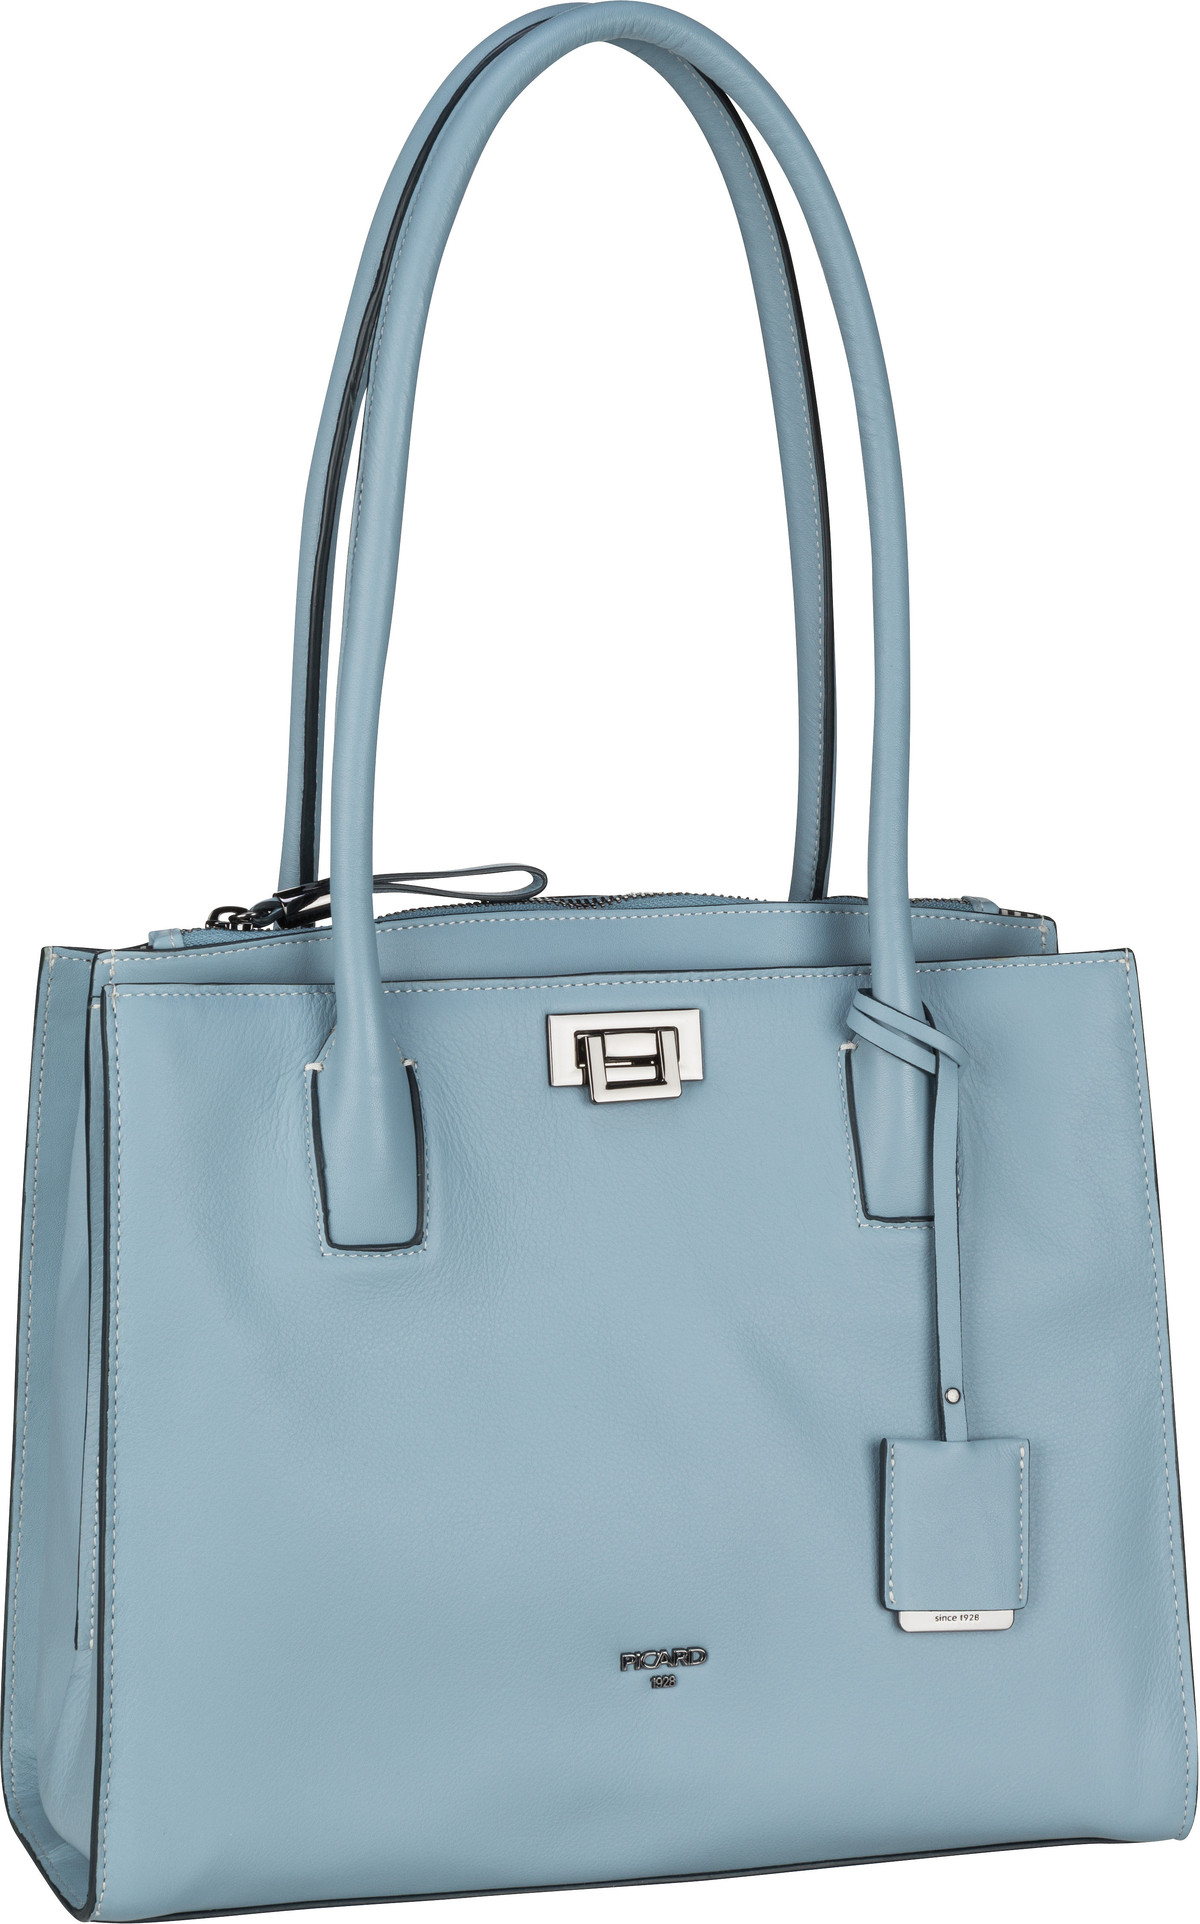 Handtasche Janis 9687 Bluebell